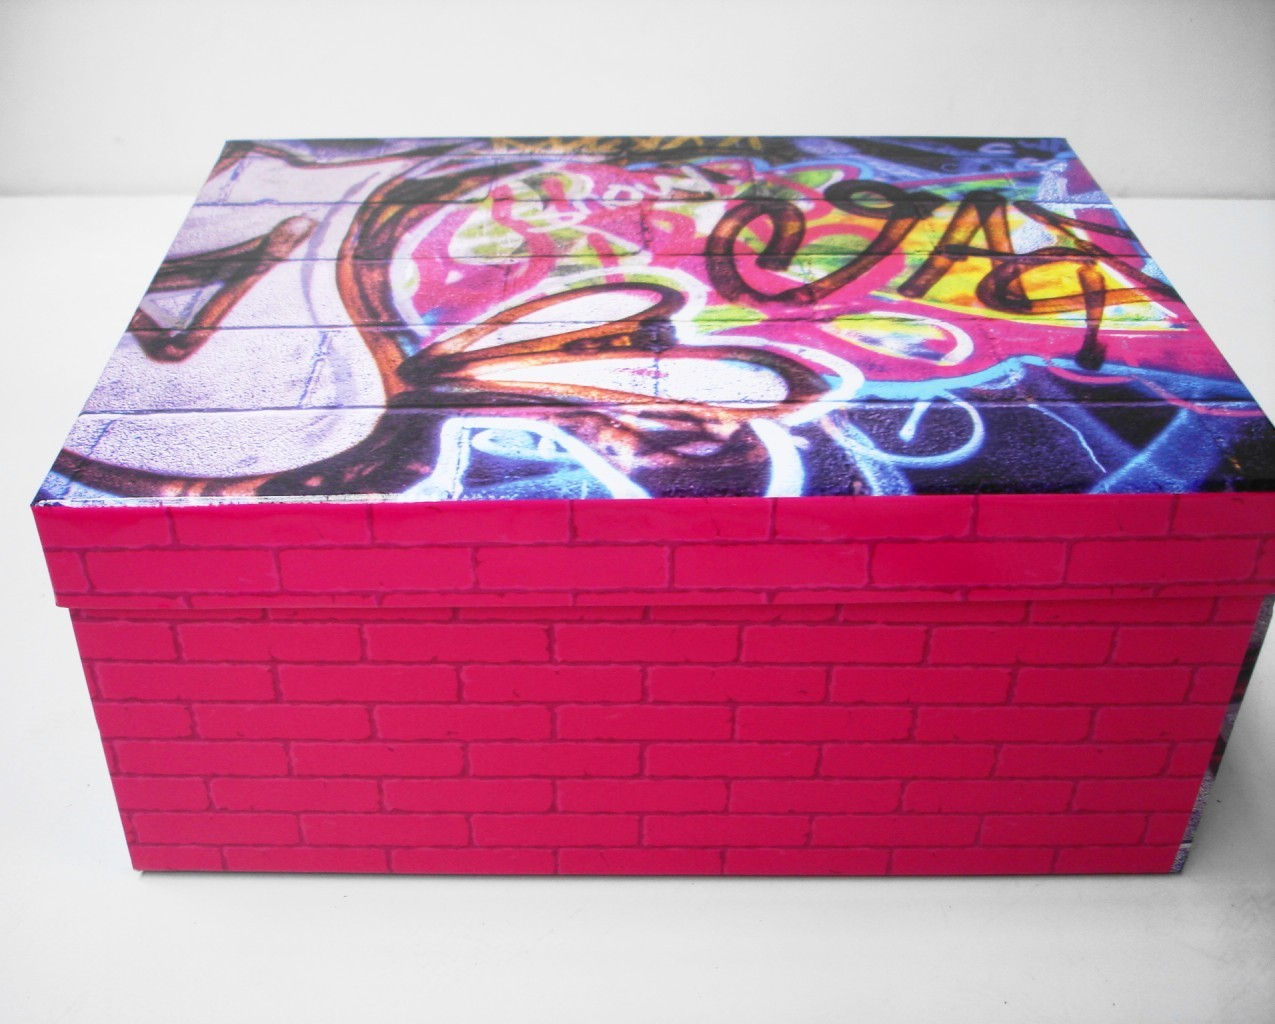 Nyc or guitar christmas birthday cardboard gift box craft